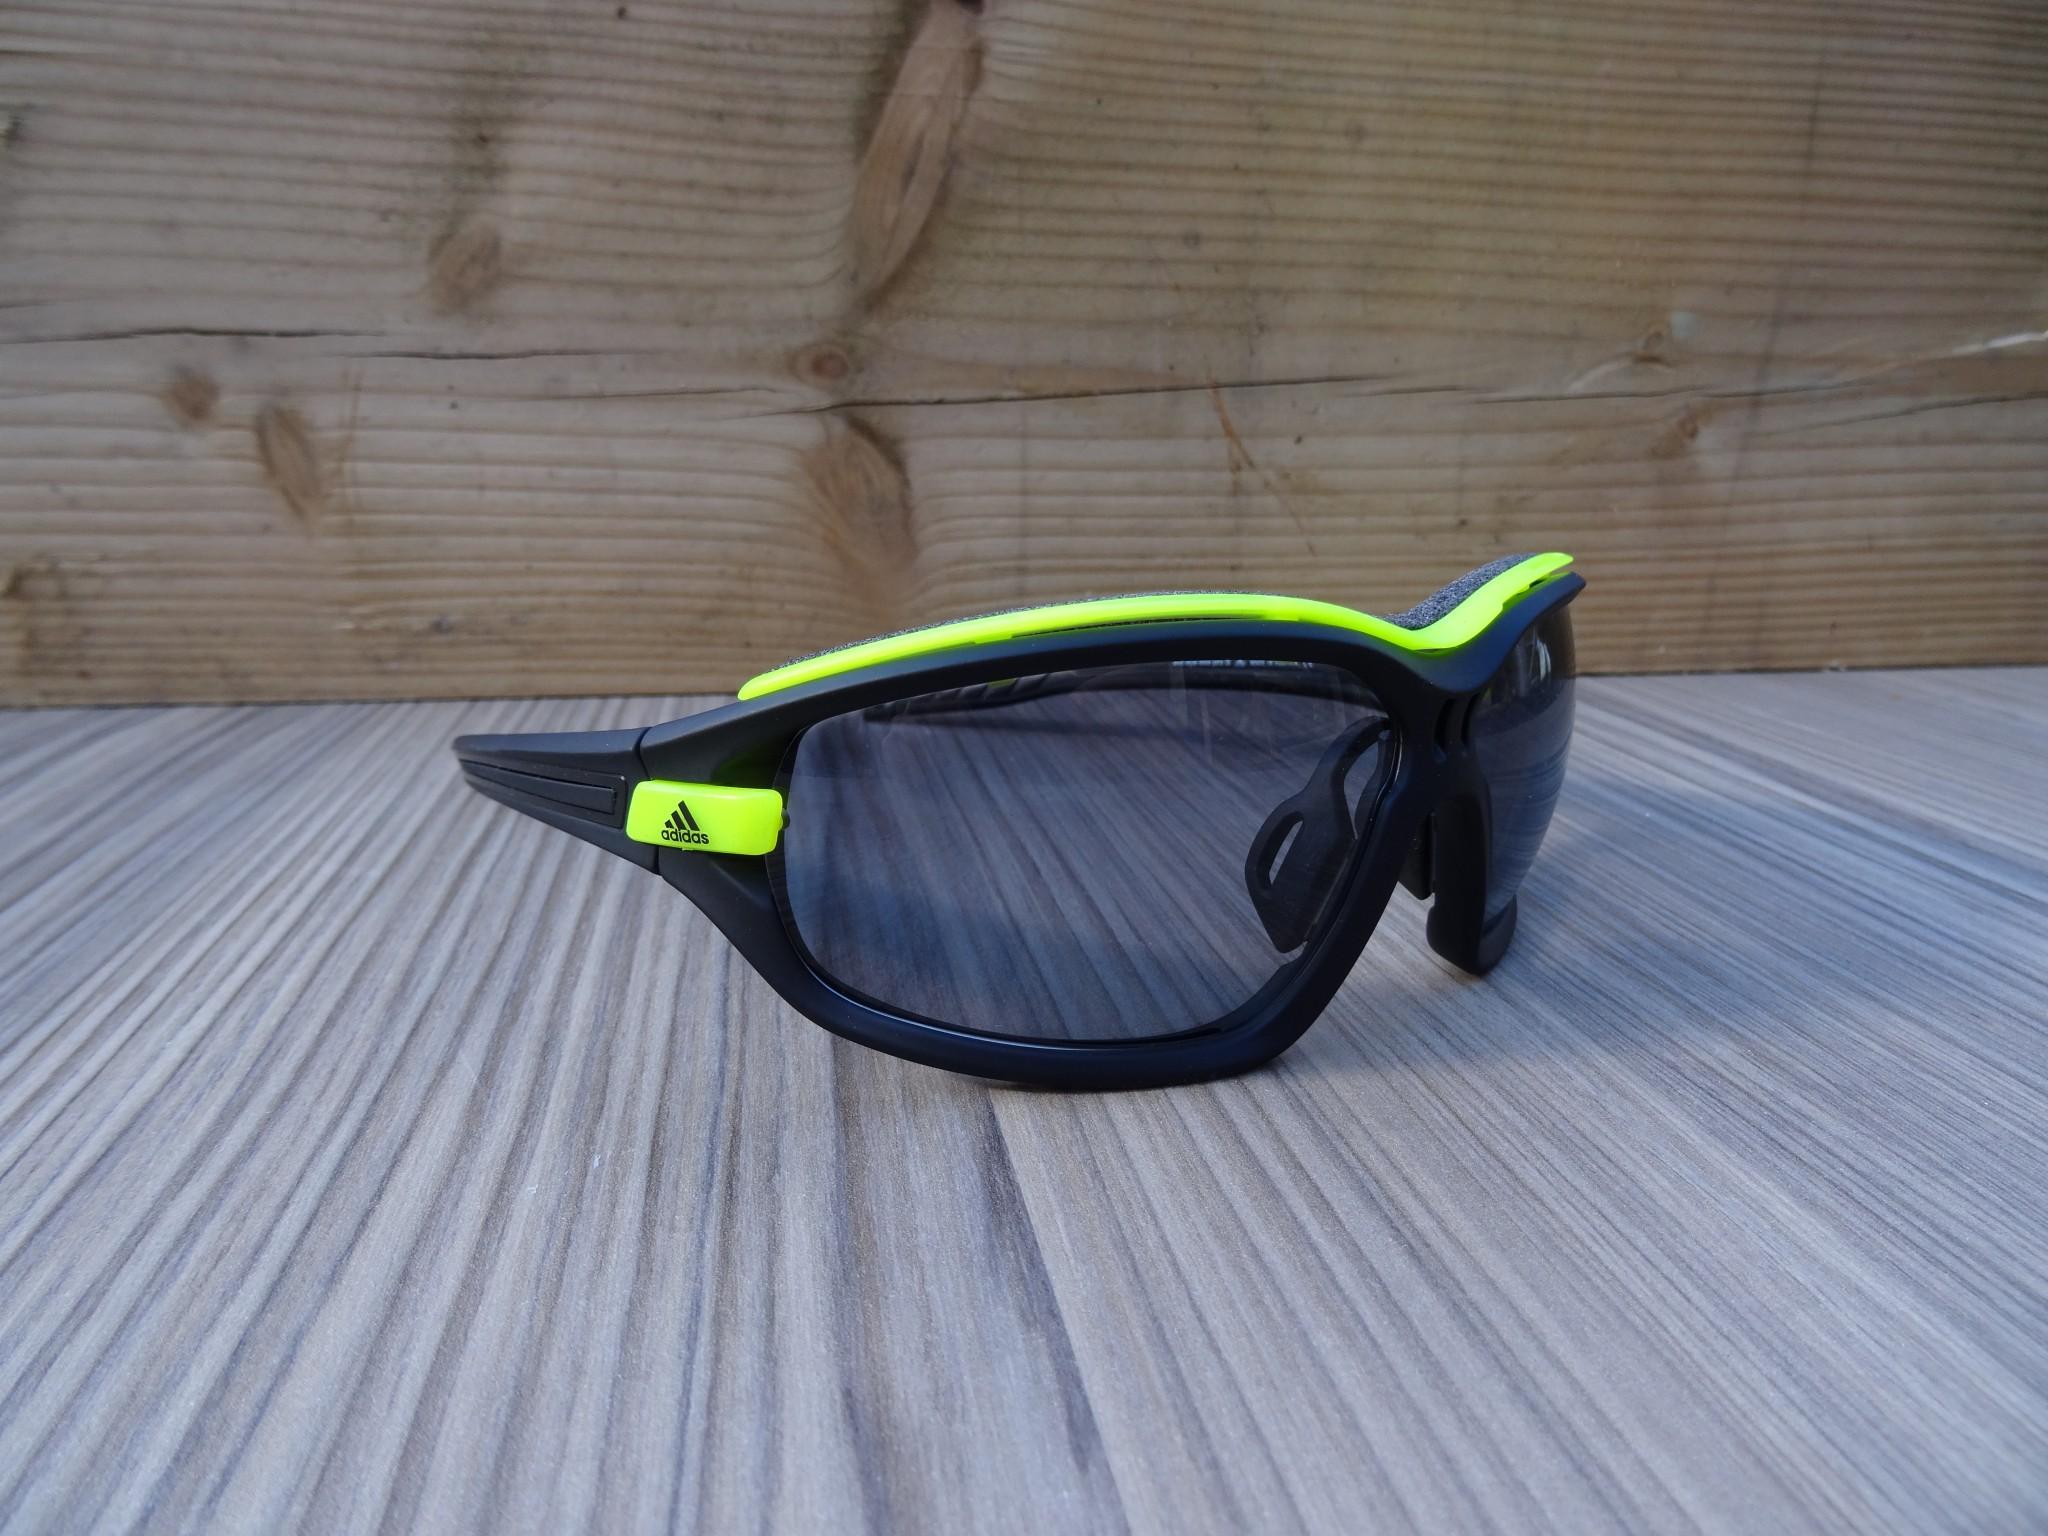 Sherlock Holmes Iluminar Química  Adidas Evil Eye Evo Pro Vario 2016   Mountain Bike Reviews » Protection »  Glasses   IMB   Free Mountain Bike Magazine Online